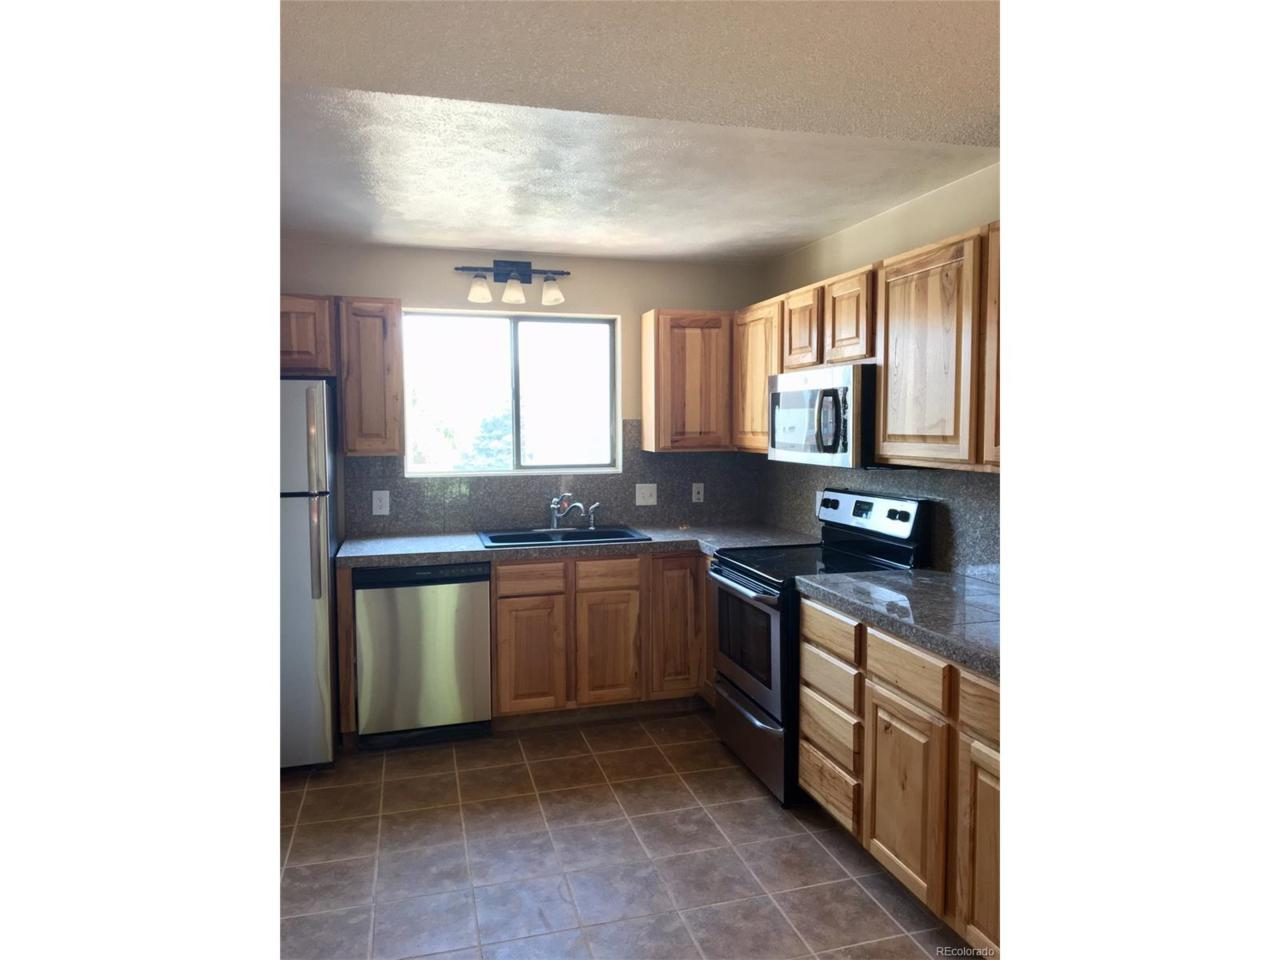 8440 Decatur Street #119, Westminster, CO 80031 (MLS #8954316) :: 8z Real Estate